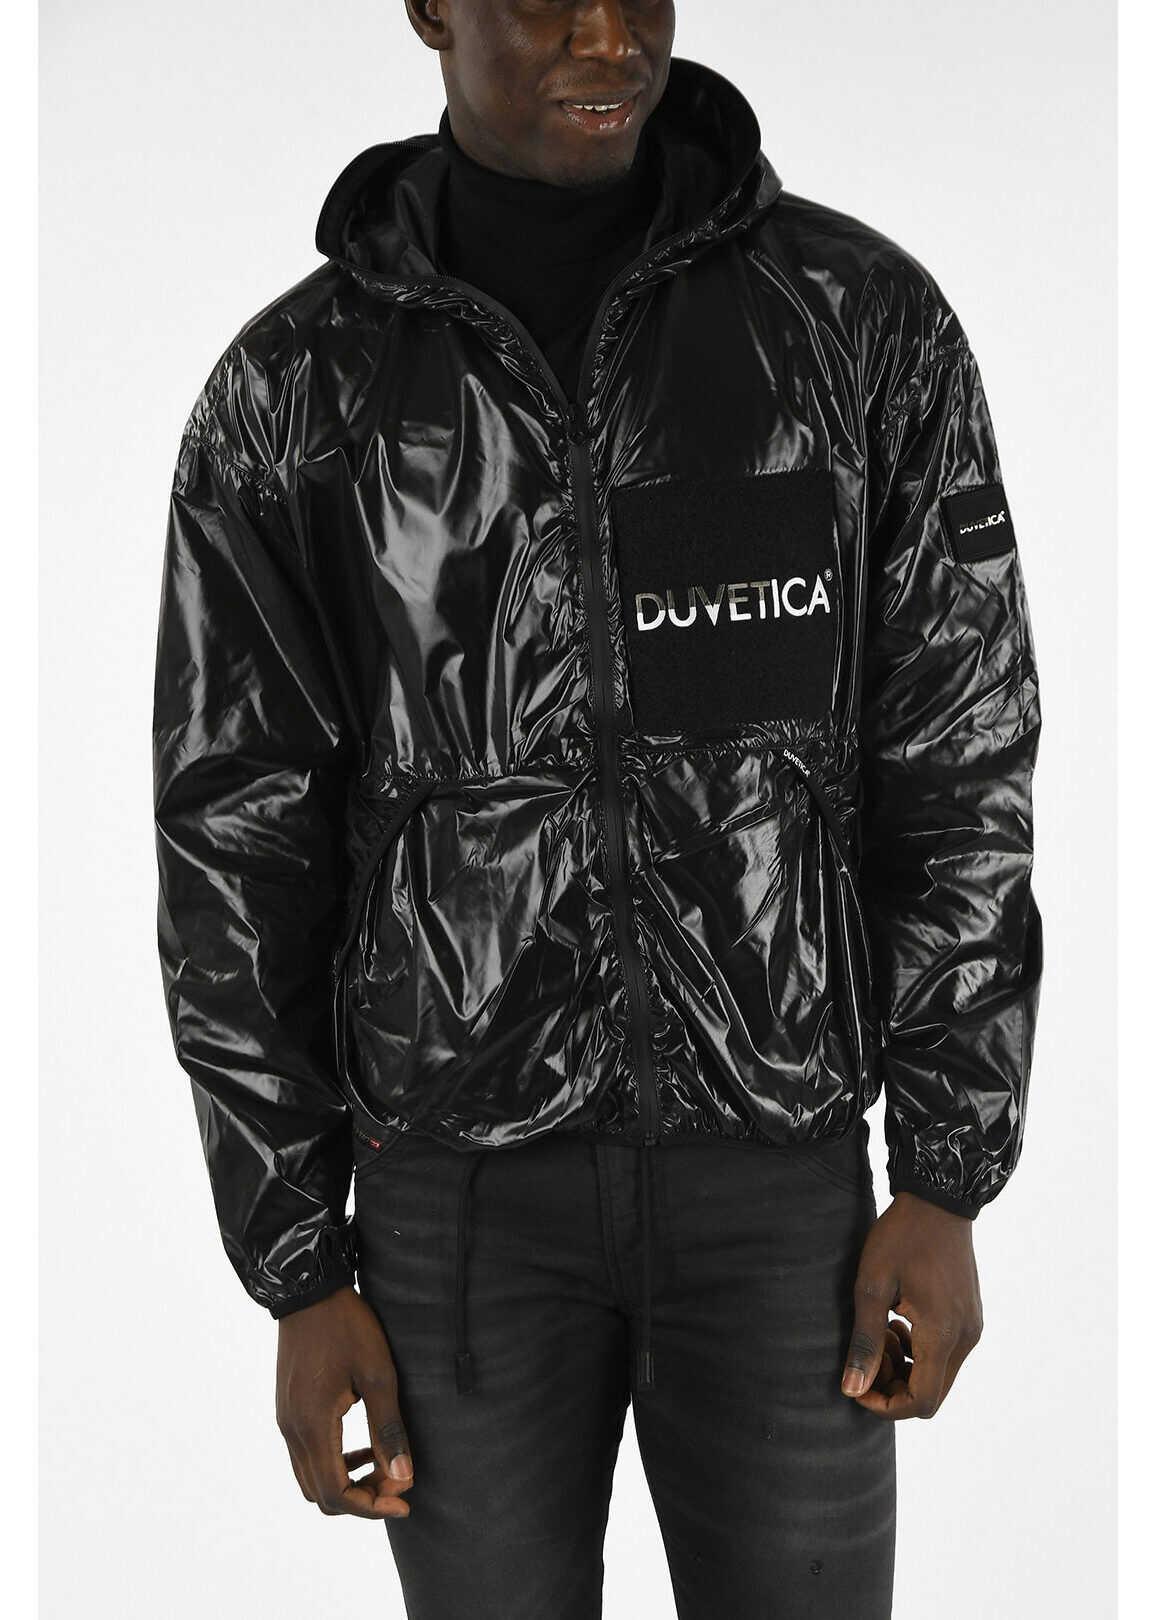 Duvetica Rain Proof CINNEIDIGH Jacket BLACK imagine